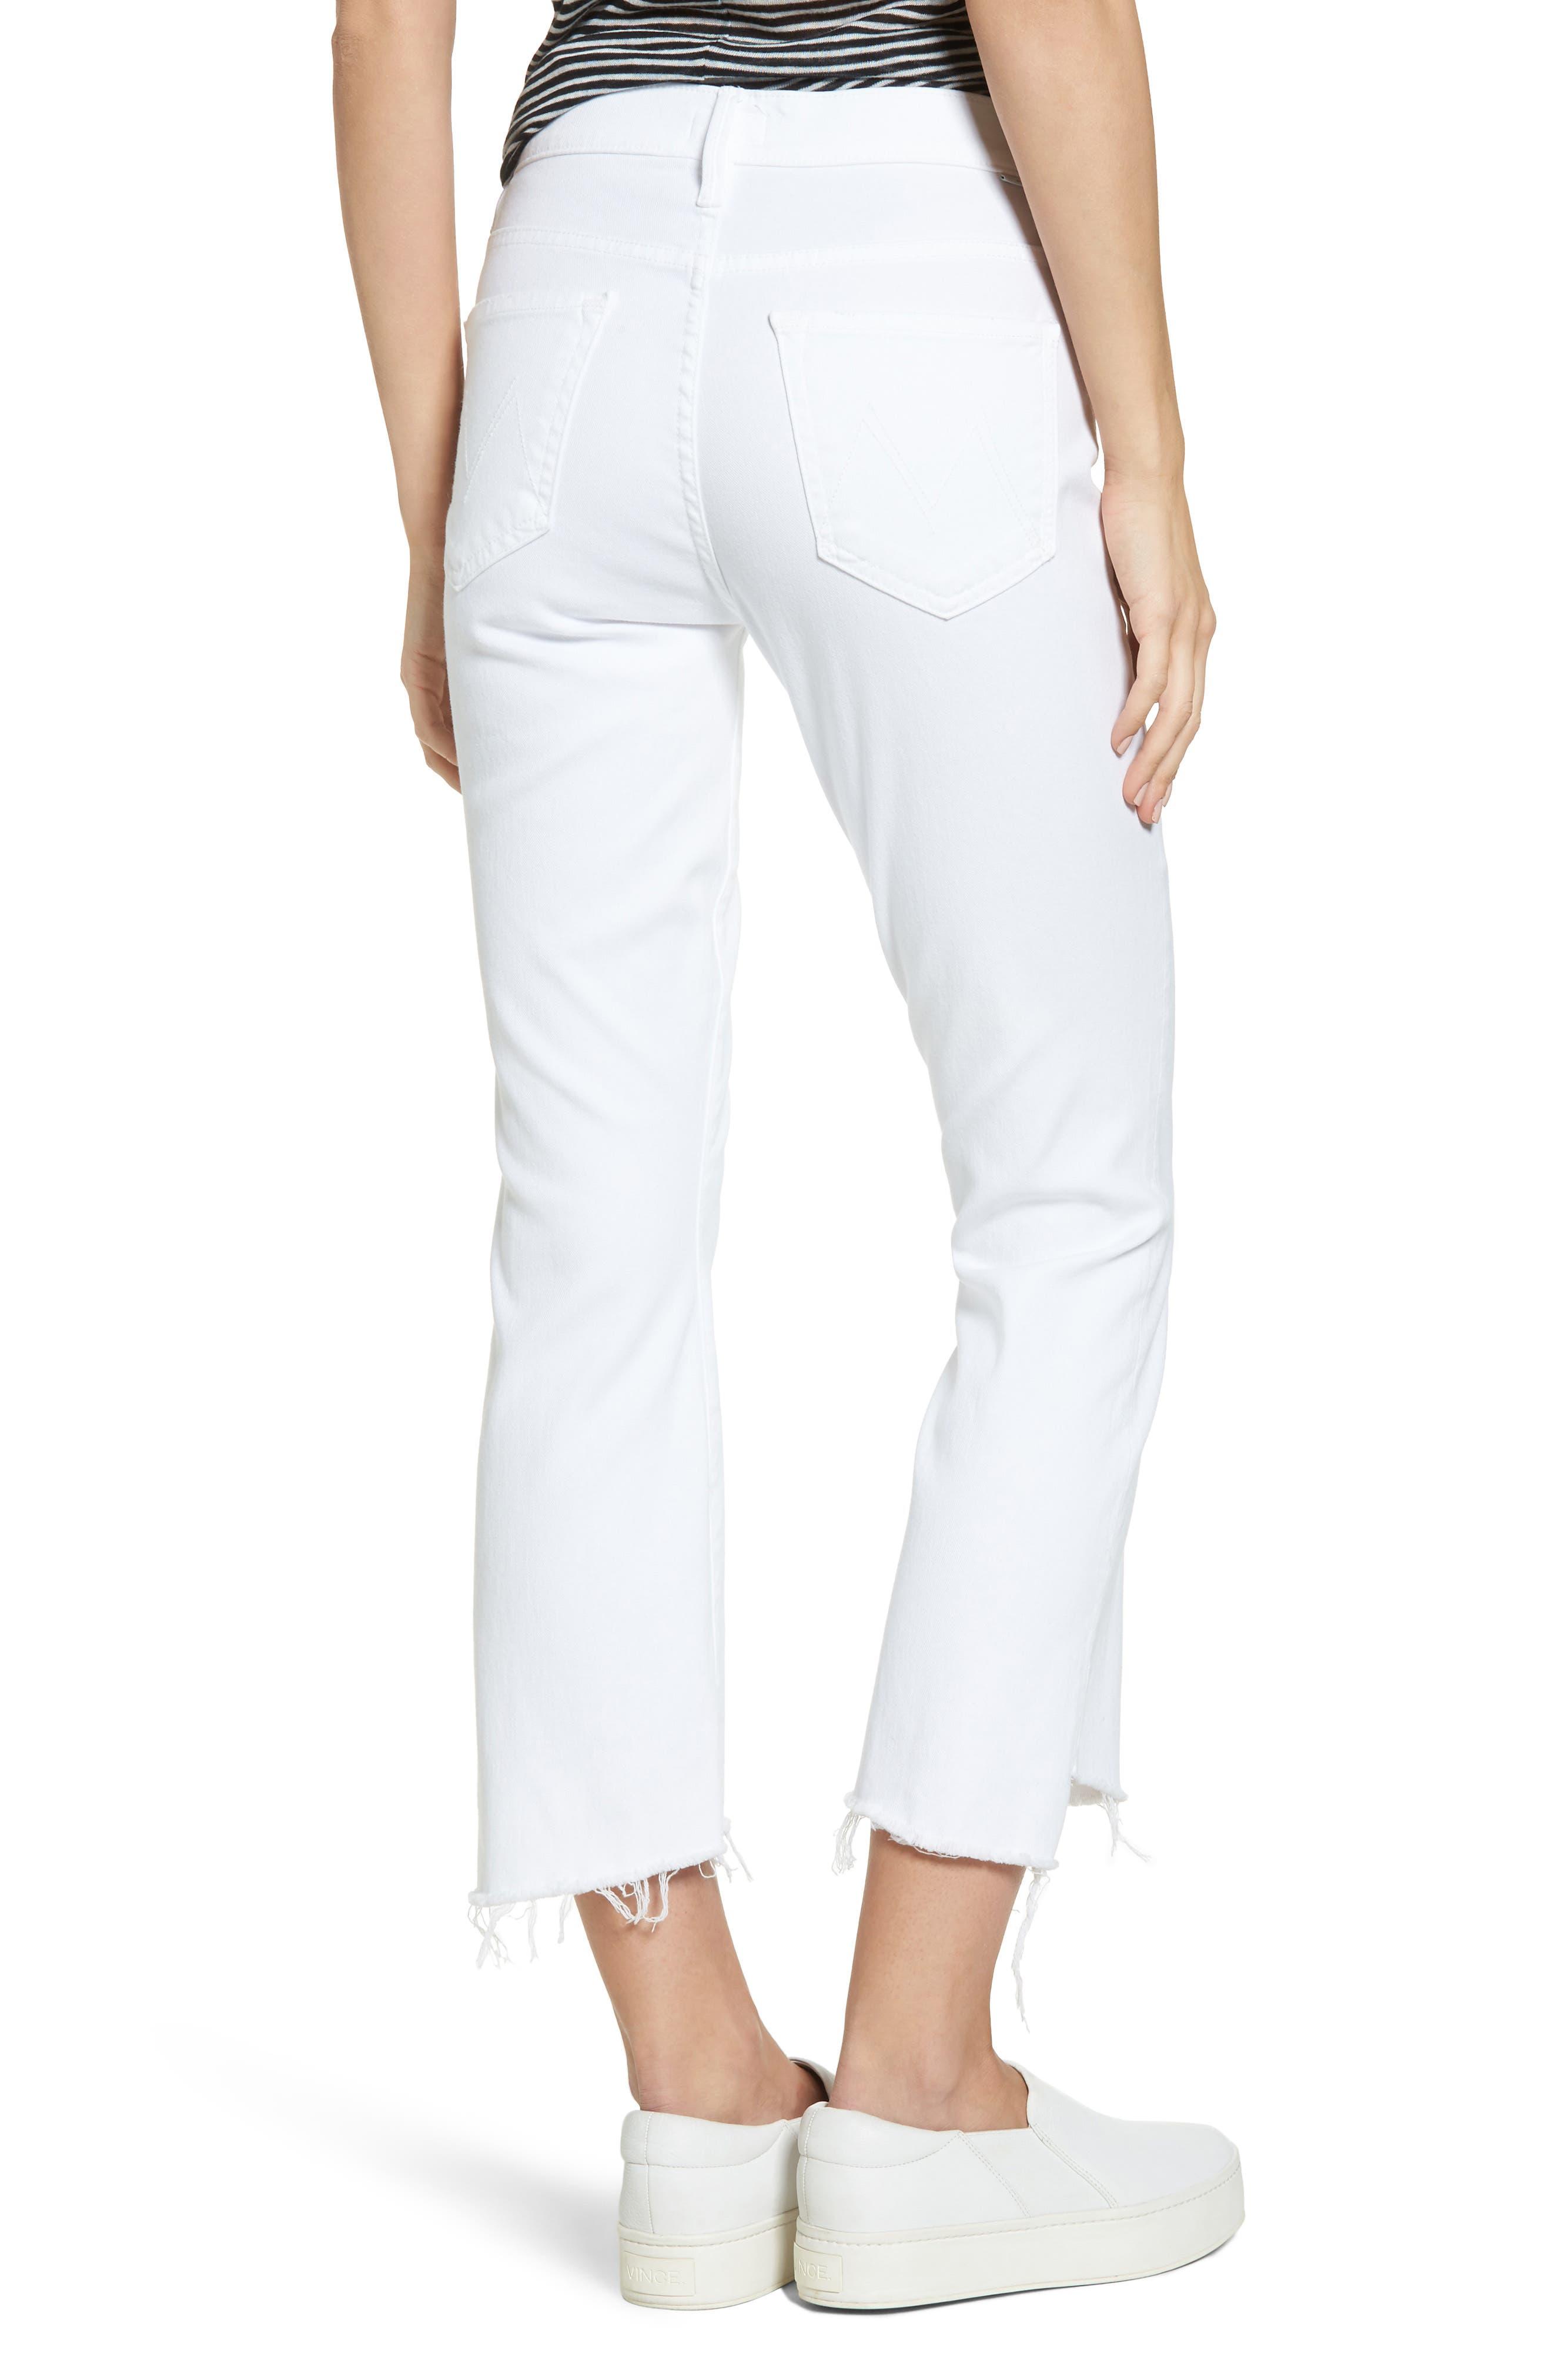 MOTHER, The Insider Step Hem Crop Bootcut Jeans, Alternate thumbnail 2, color, 100